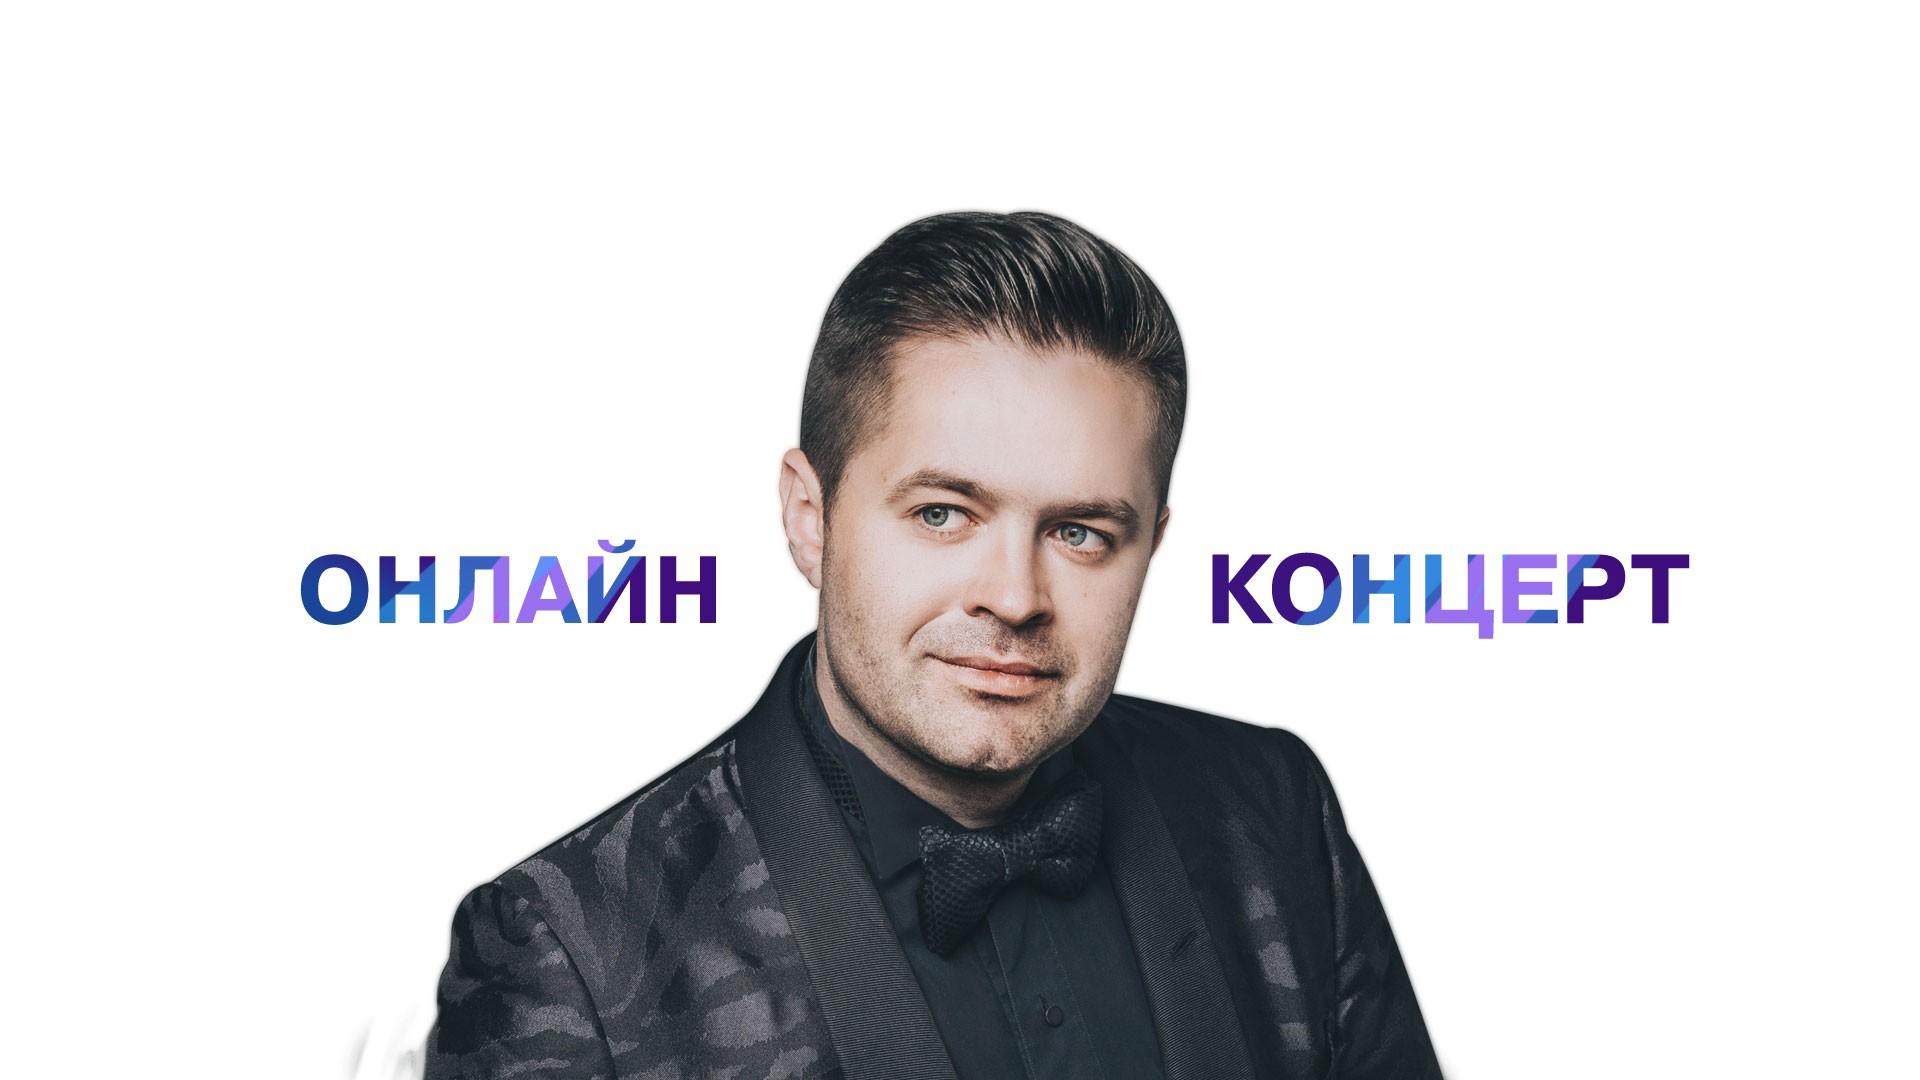 Сергей Волчков. Онлайн концерт